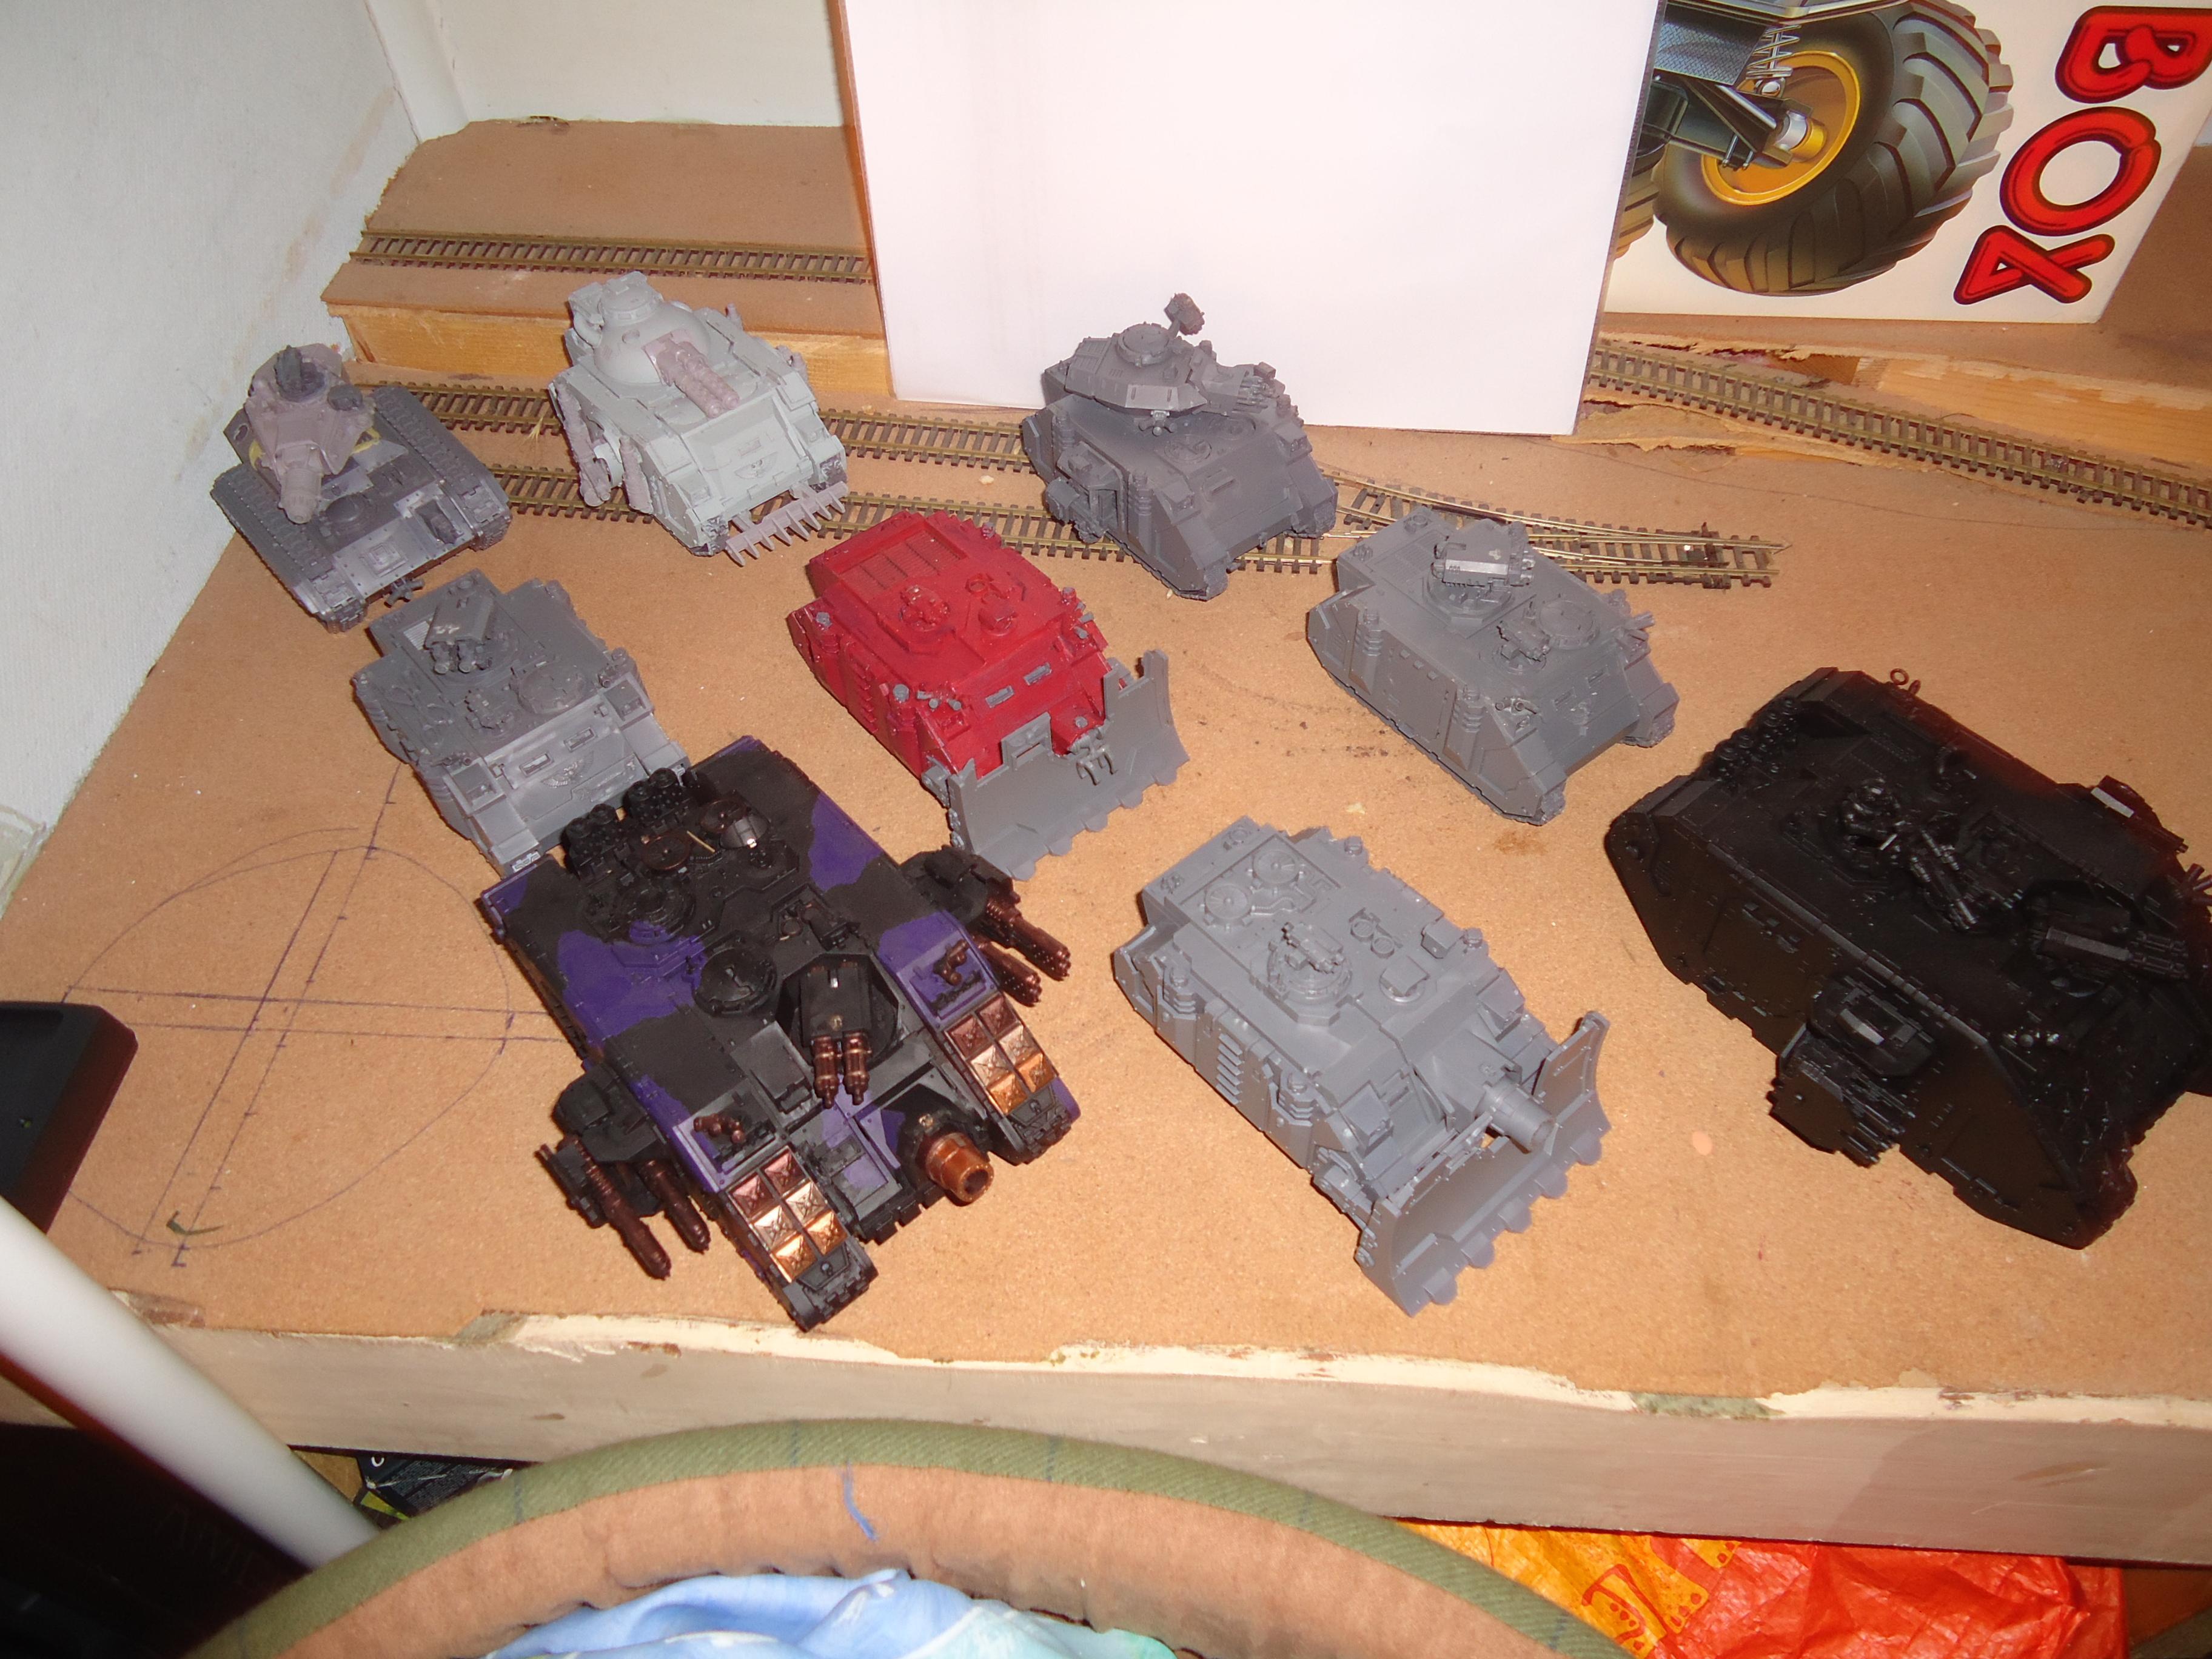 Ares, Crusader, Land Raider, Leman Russ, Razorback, Rhino, Techmarine, Vindicator